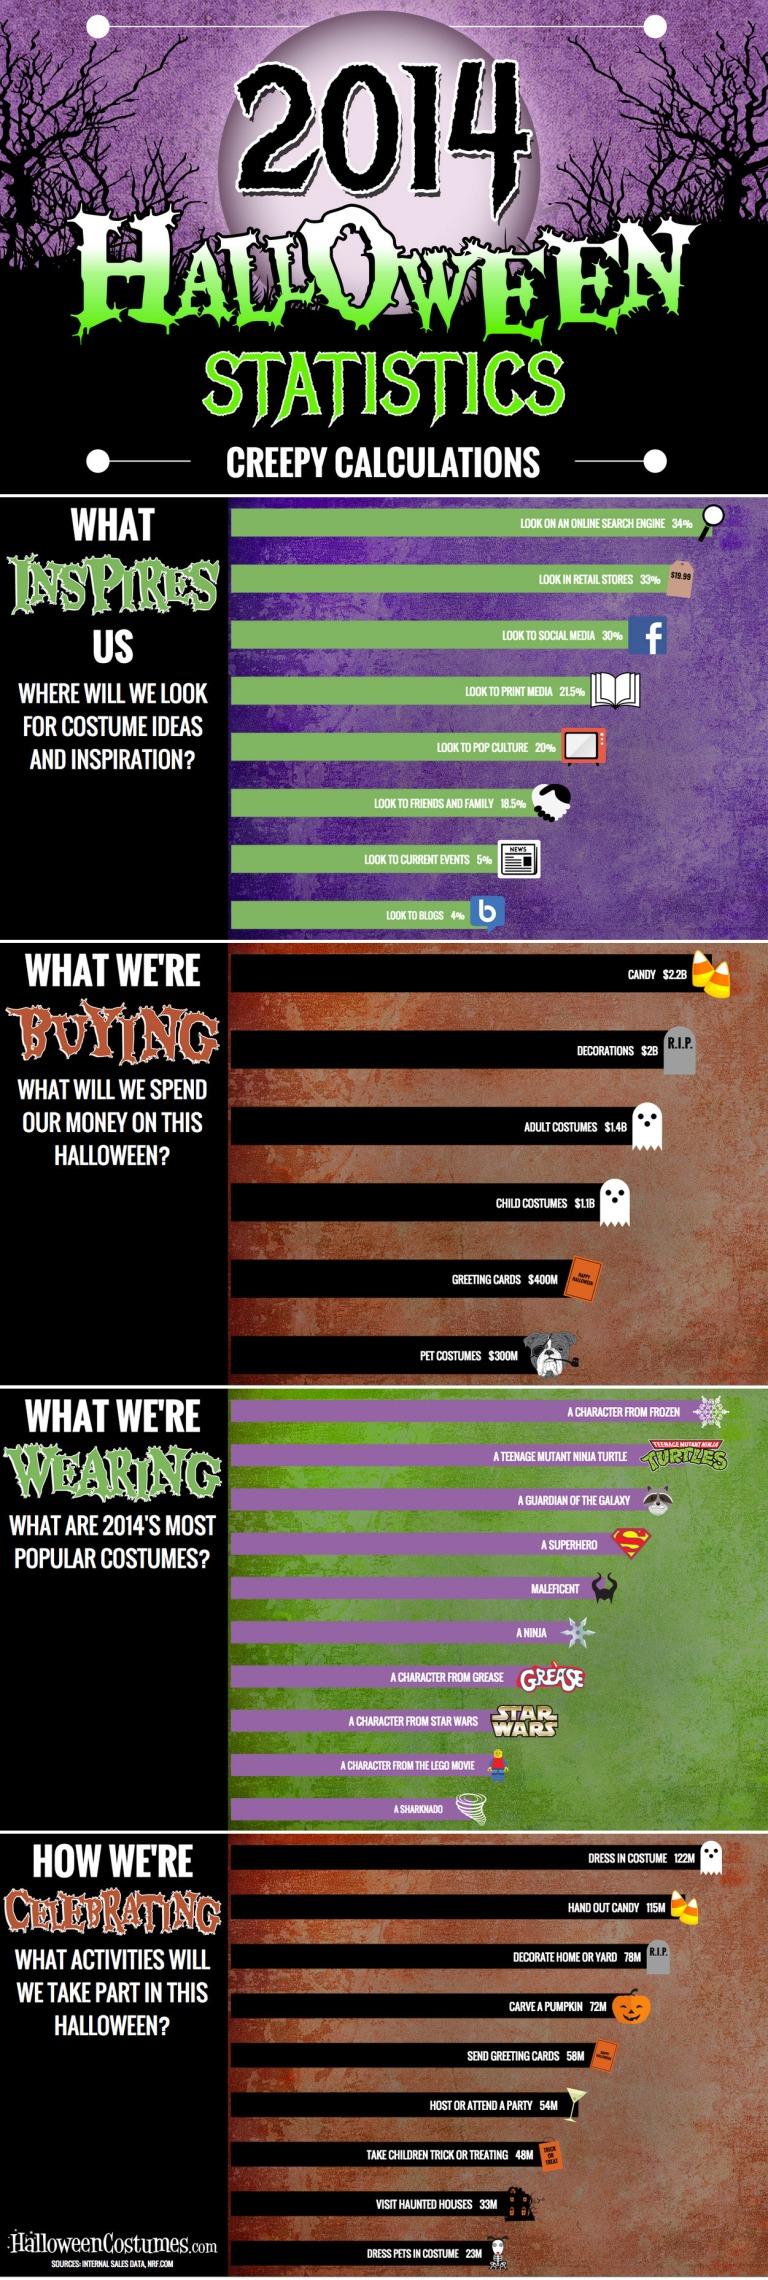 2014 Halloween Statistics